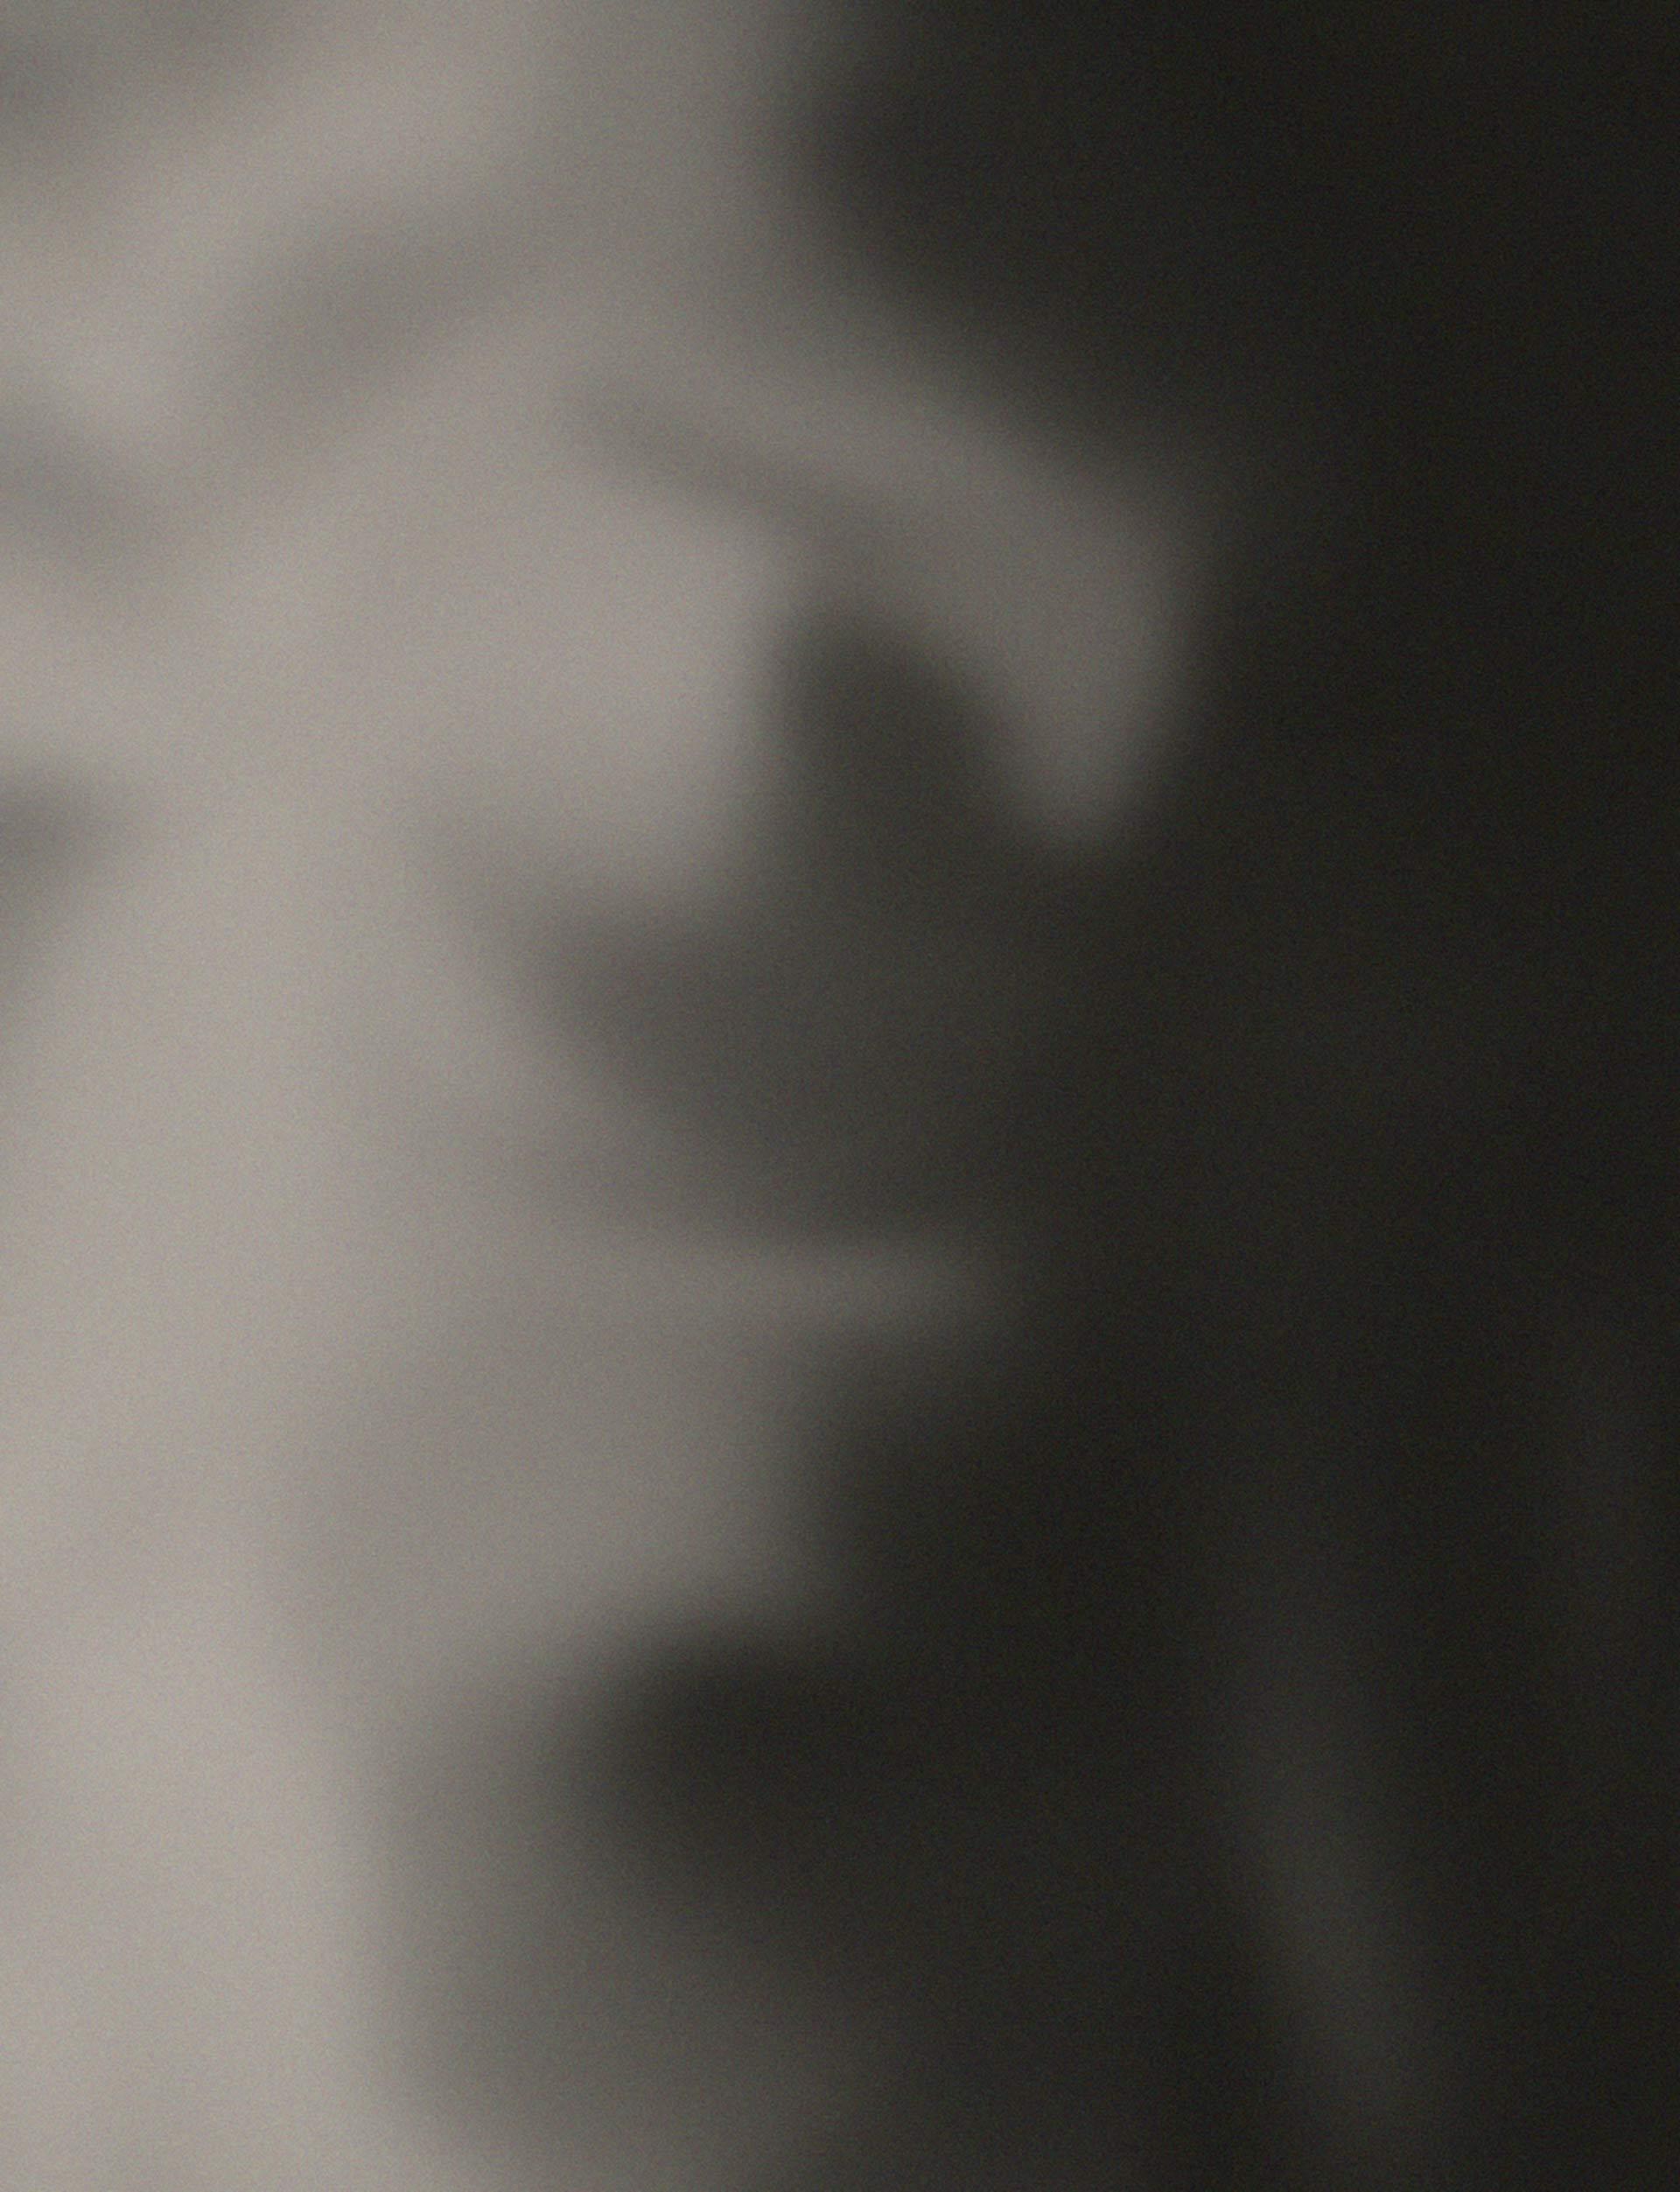 smokey background